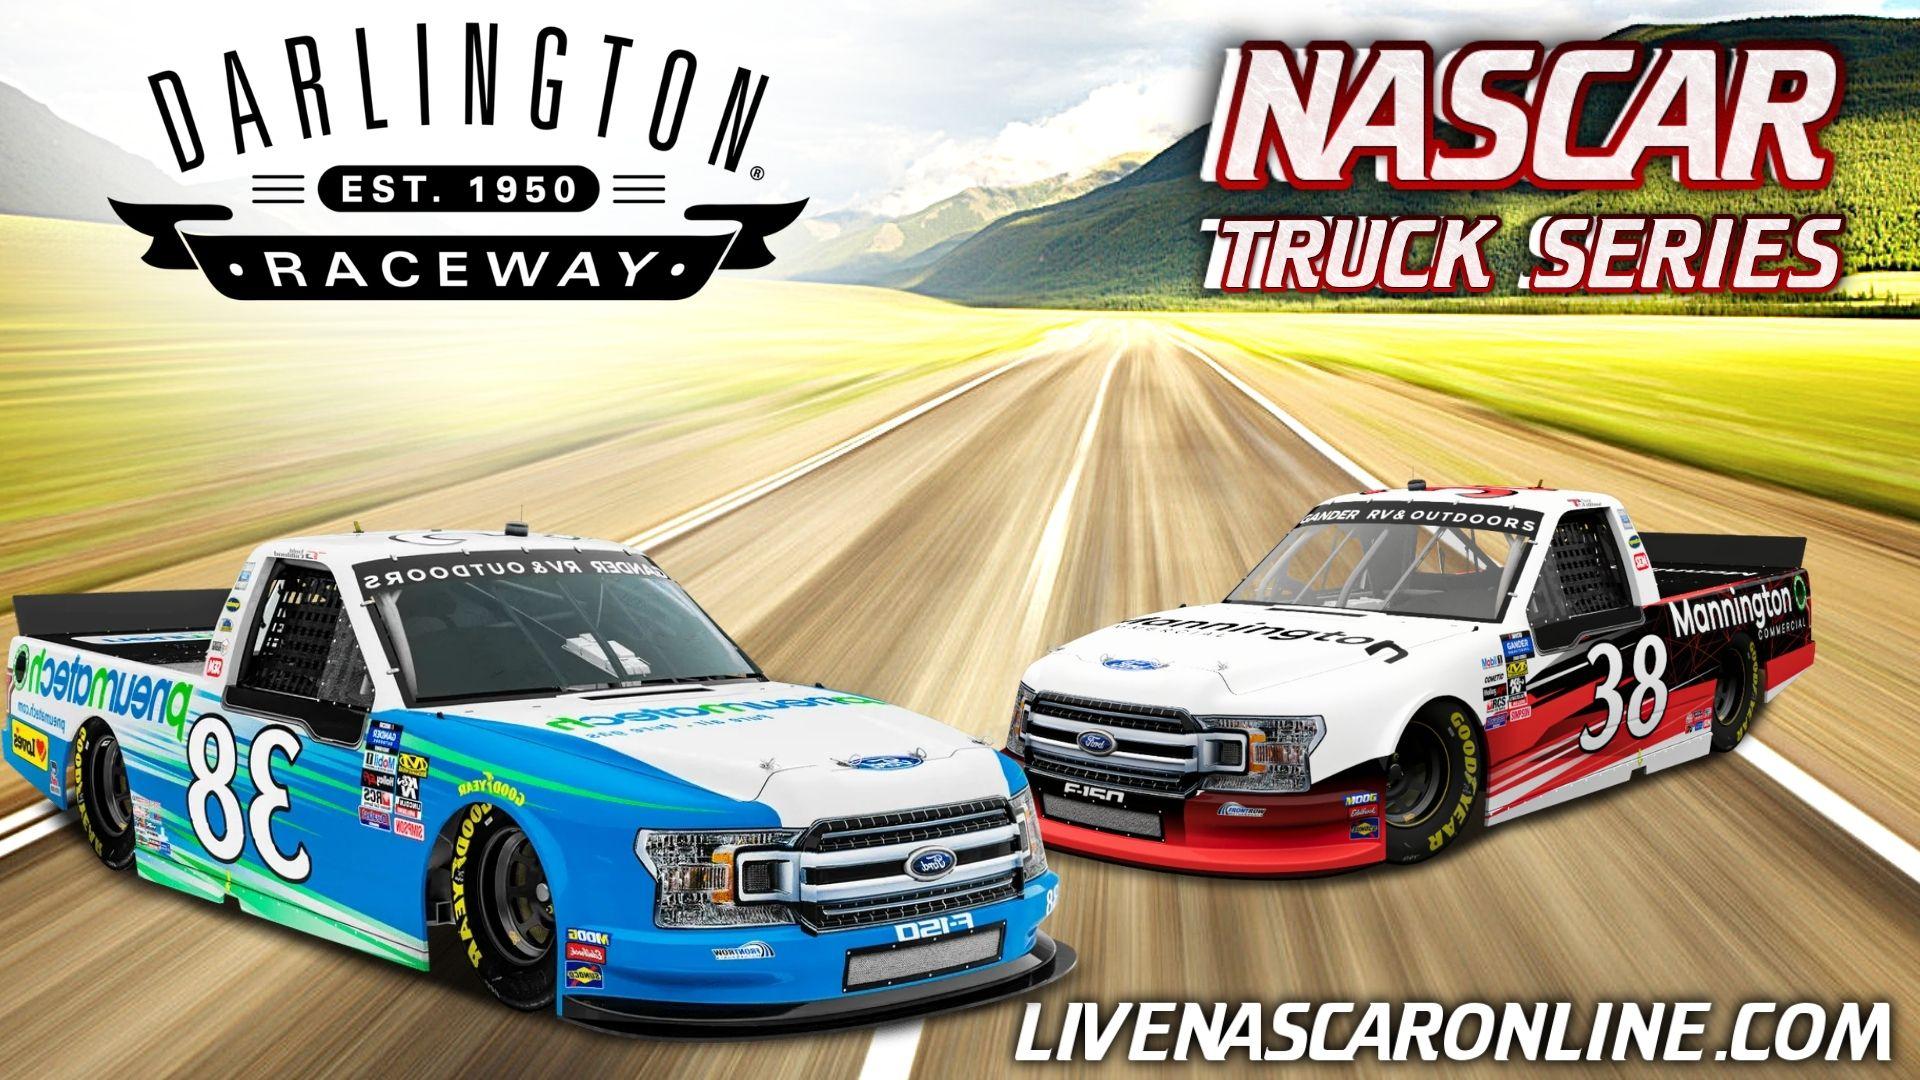 NASCAR Truck Darlington Race 2 Live Stream